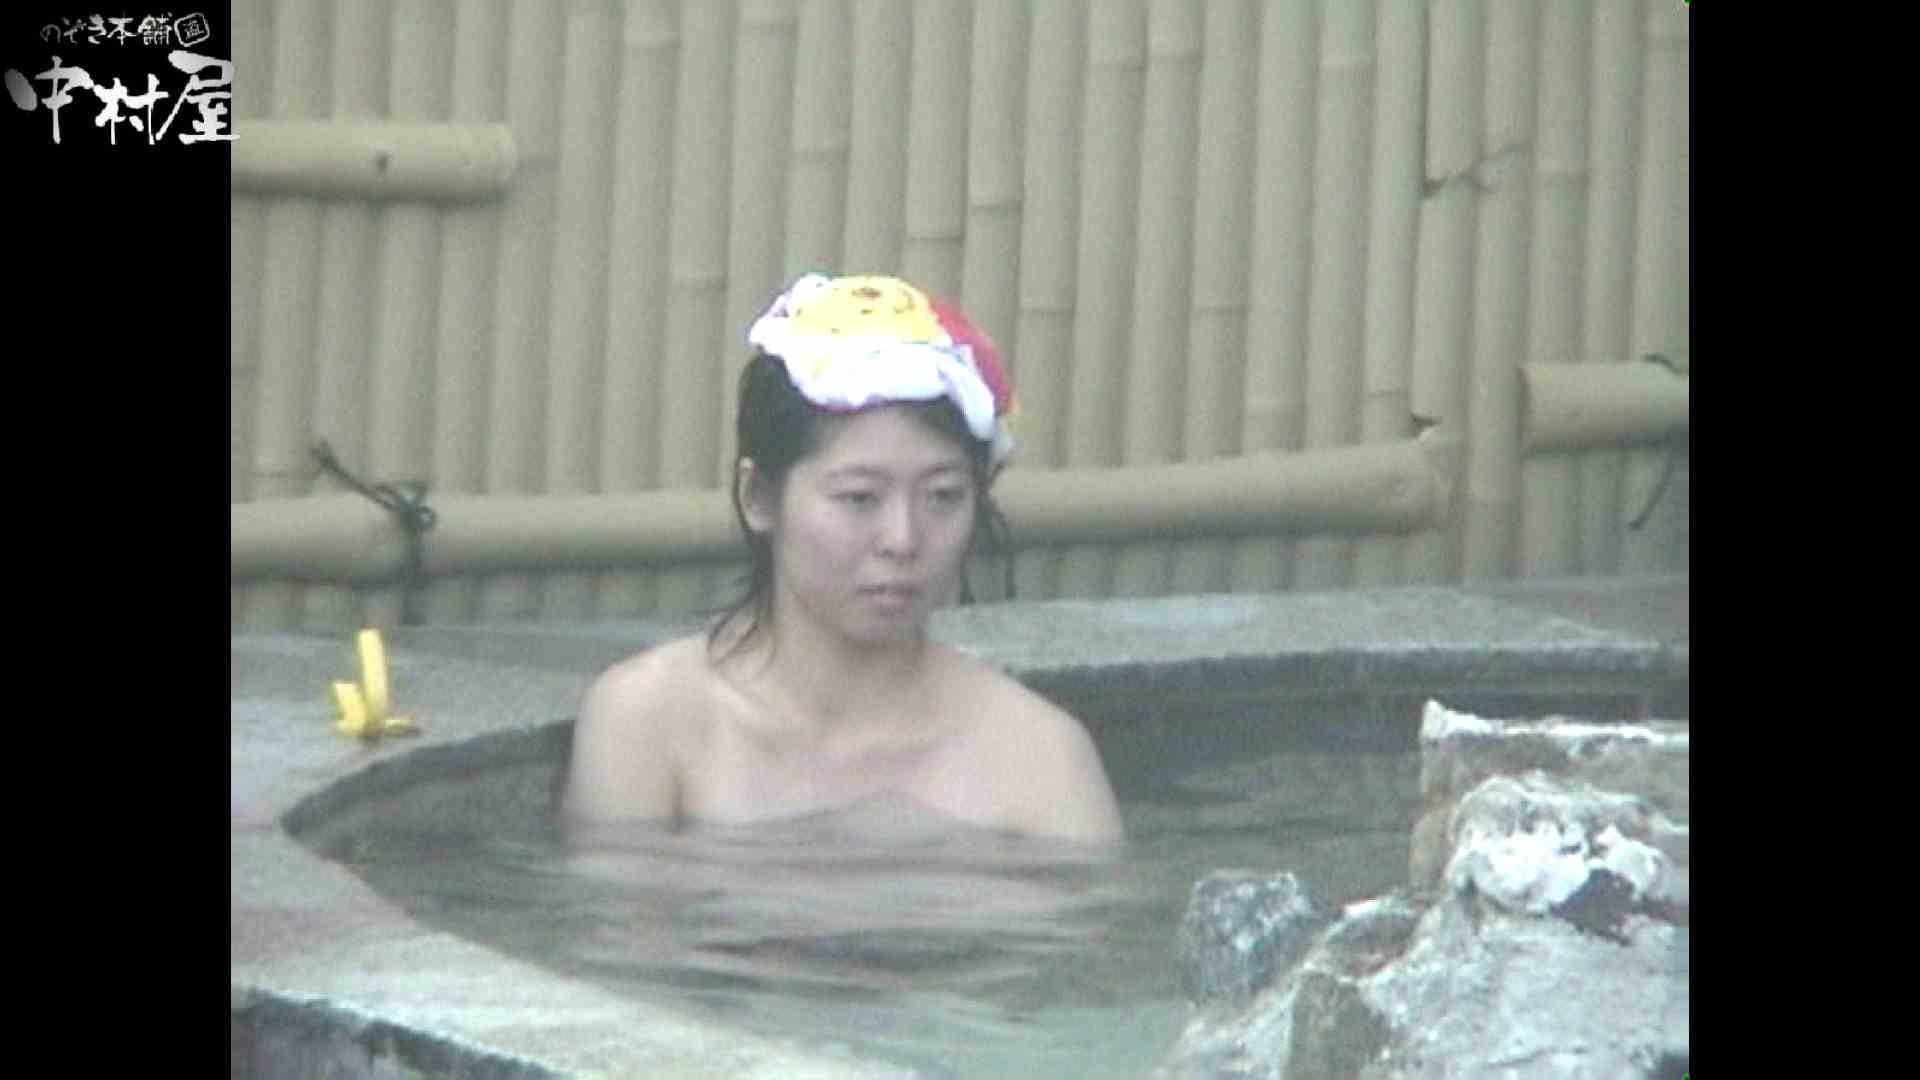 Aquaな露天風呂Vol.932 盗撮師作品  106pic 27